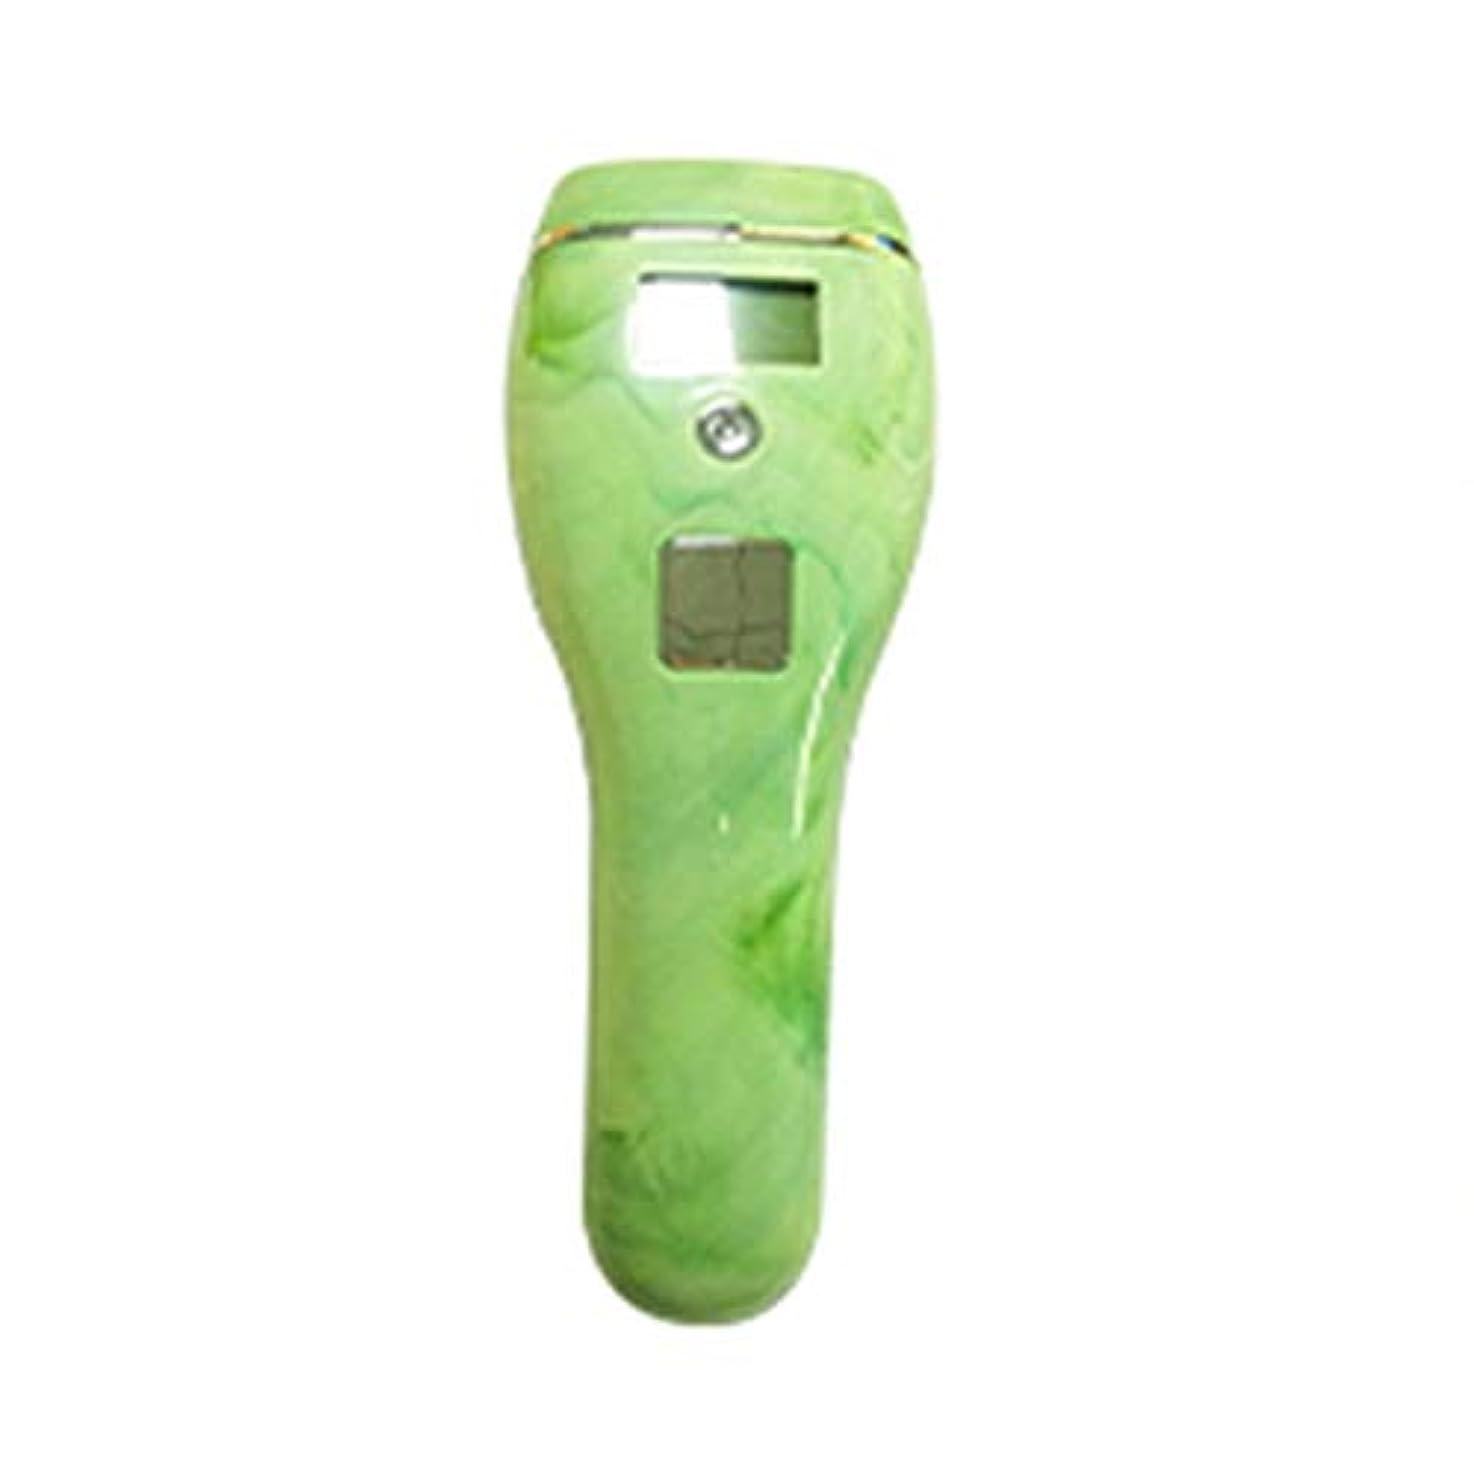 Xihouxian 自動肌のカラーセンシング、グリーン、5速調整、クォーツチューブ、携帯用痛みのない全身凍結乾燥用除湿器、サイズ19x7x5cm D40 (Color : Green)